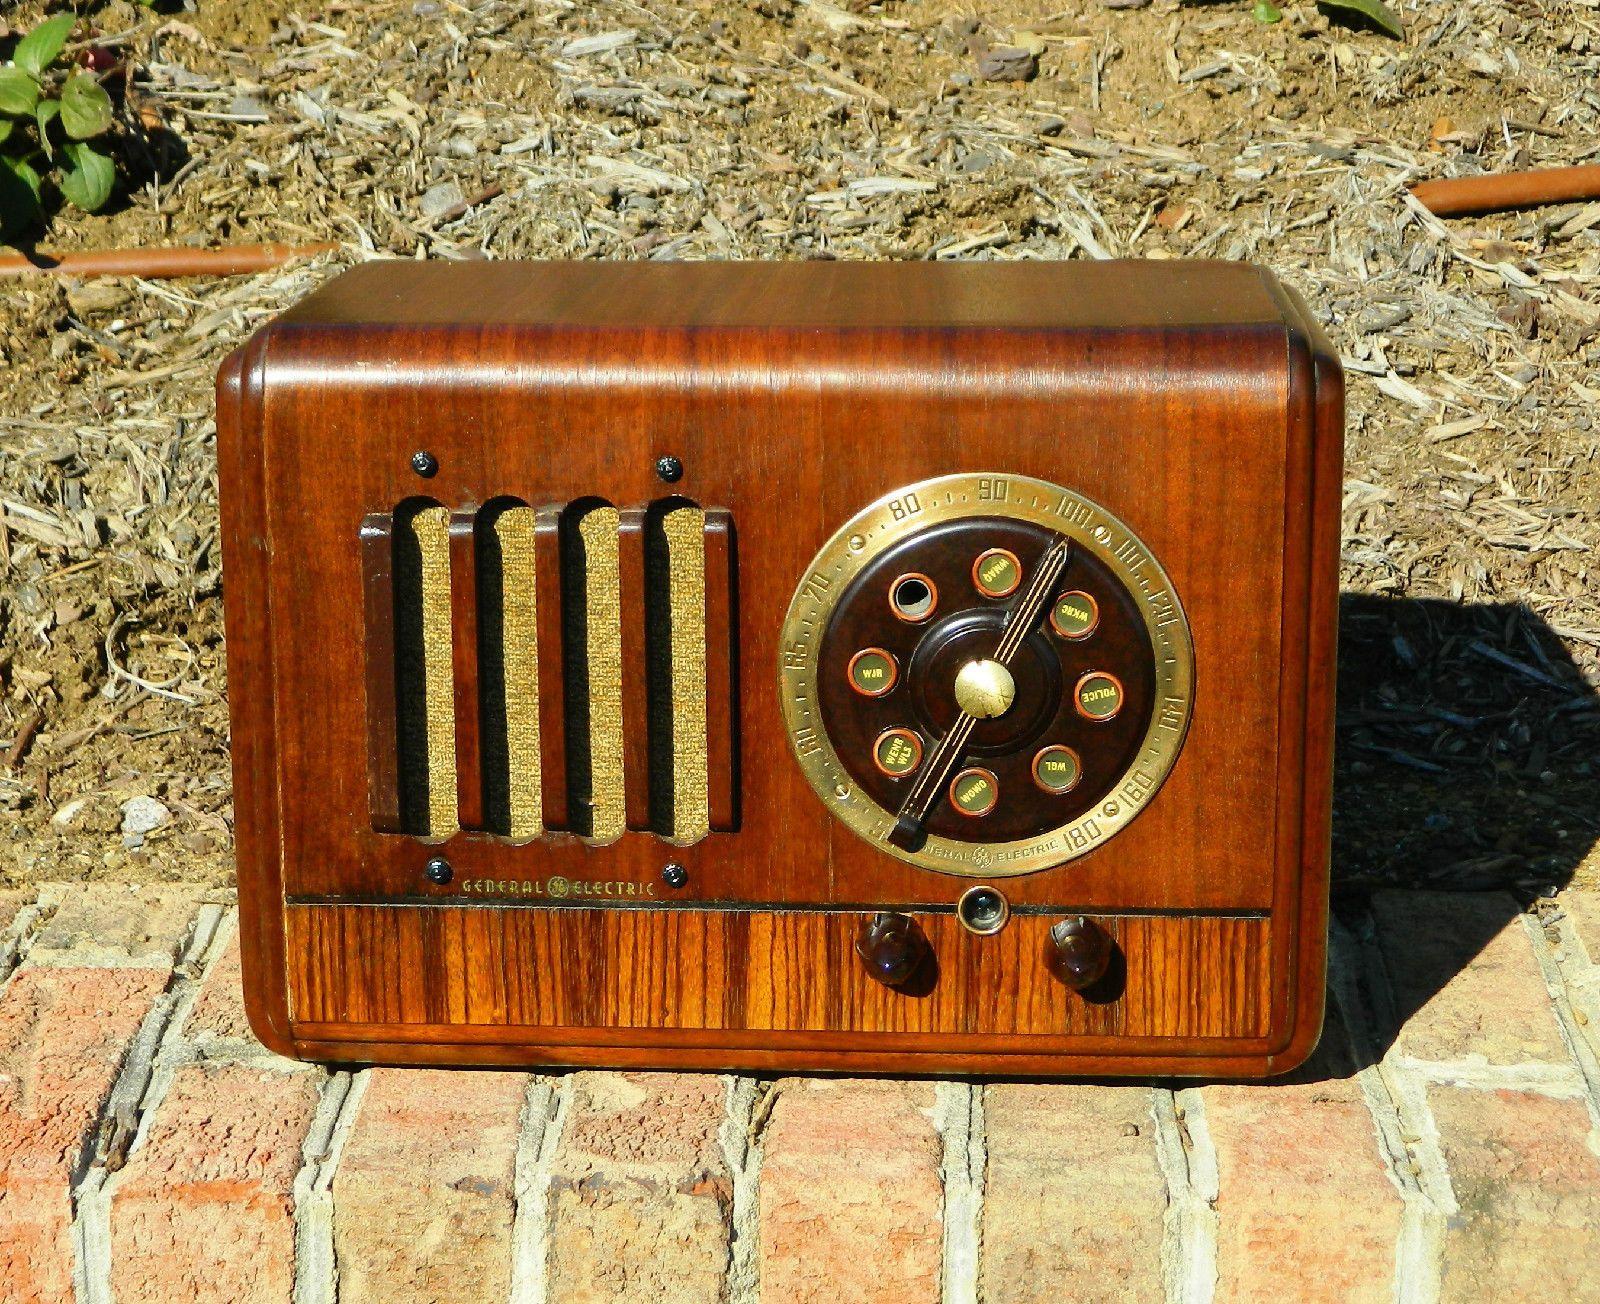 1937 Ge General Electric Antique Am Radio Model G 50 Looks Good And Works Ebay Vintage Radio Antique Radio Retro Radios